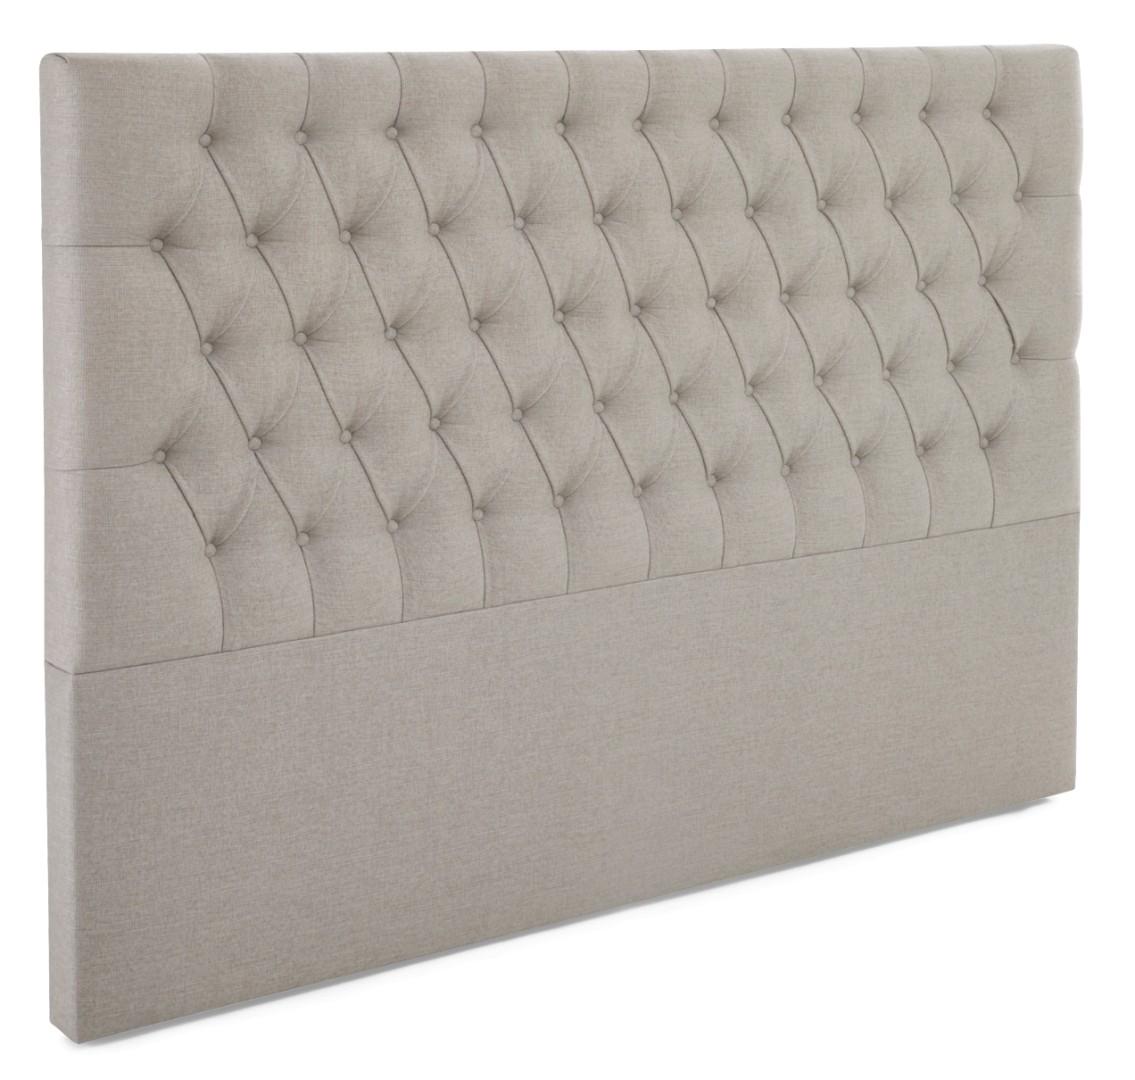 Asko Bonnell ELISE-sängynpääty 180 cm